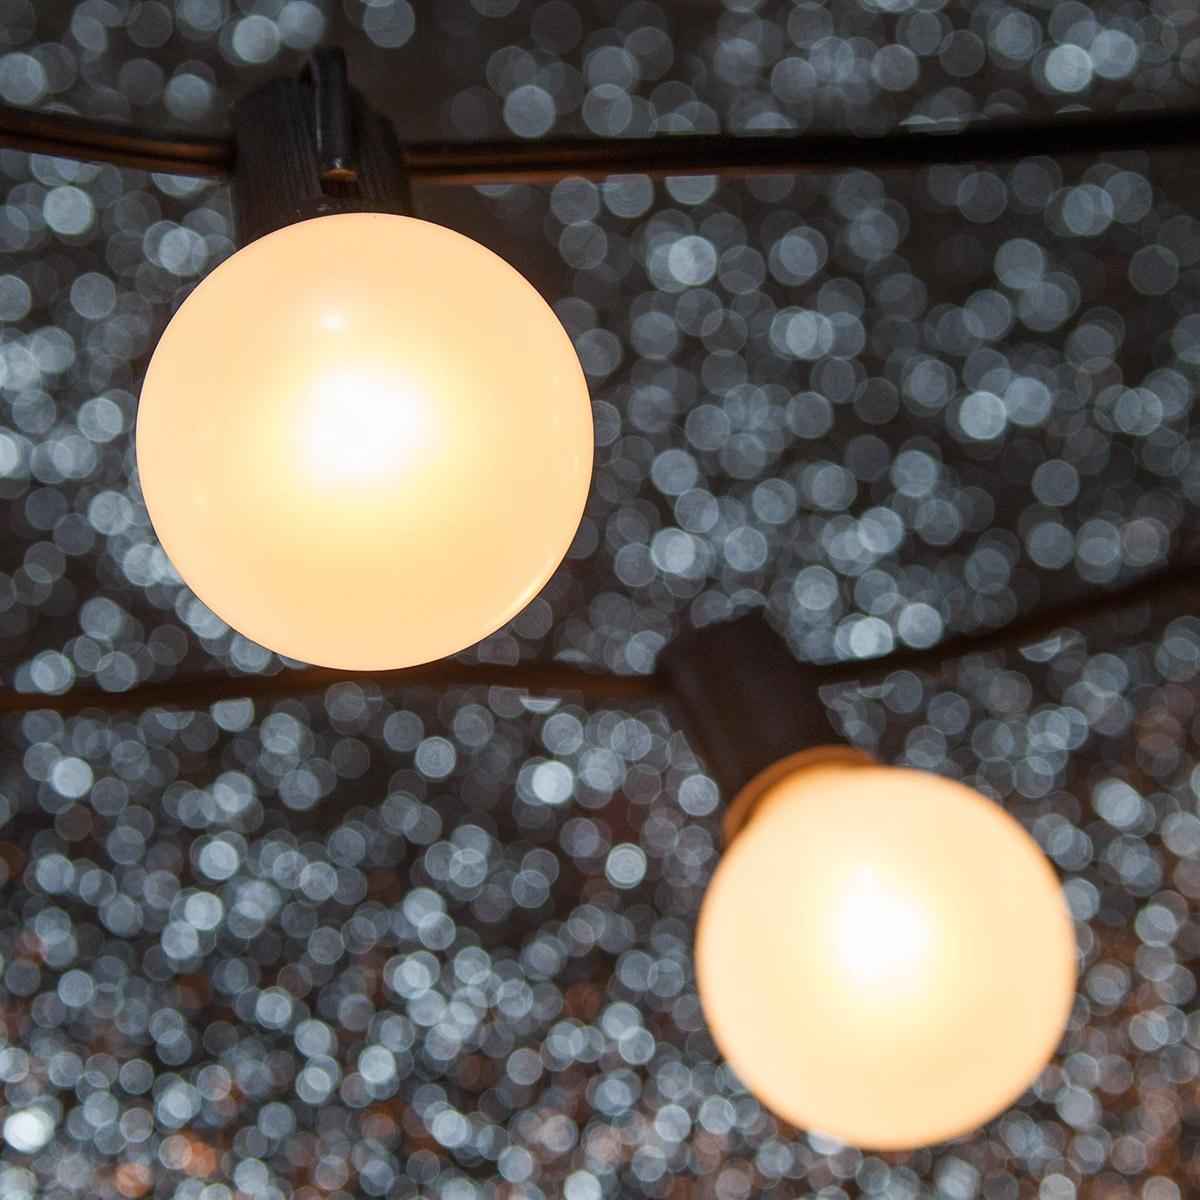 Patio Lights Pearl White Satin Lights 15 G50 E17 Bulbs